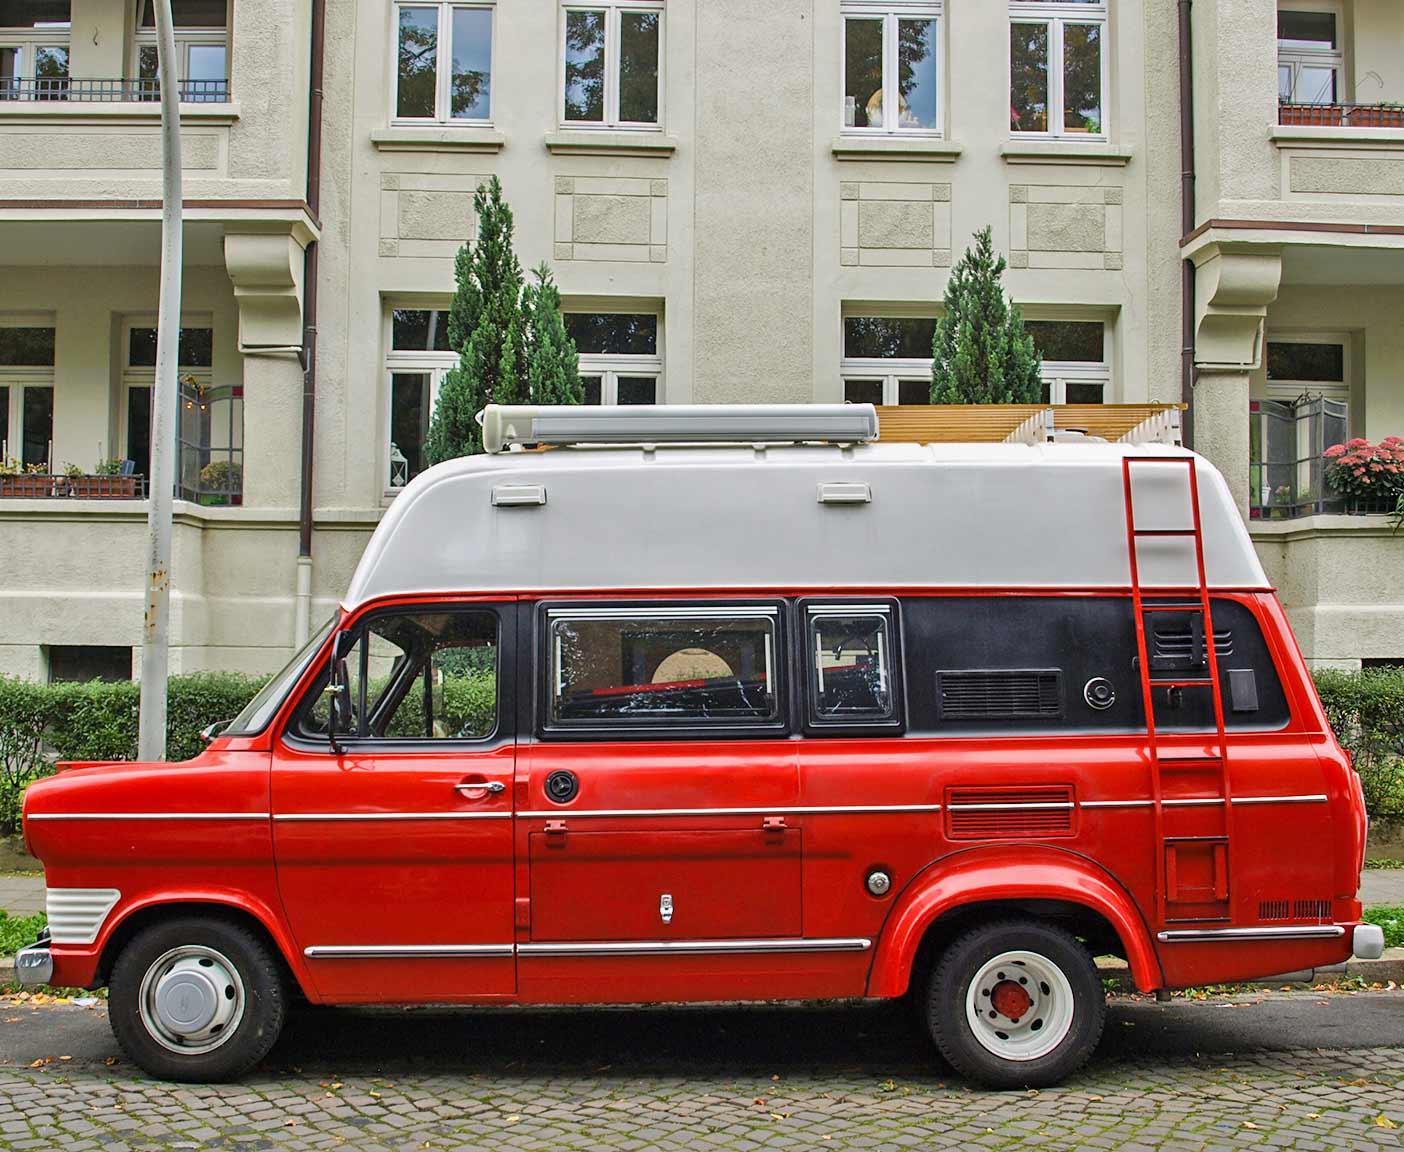 Ford Transit MK1 als Camper - Oldtimer Wohnmobil im Selbstausbau